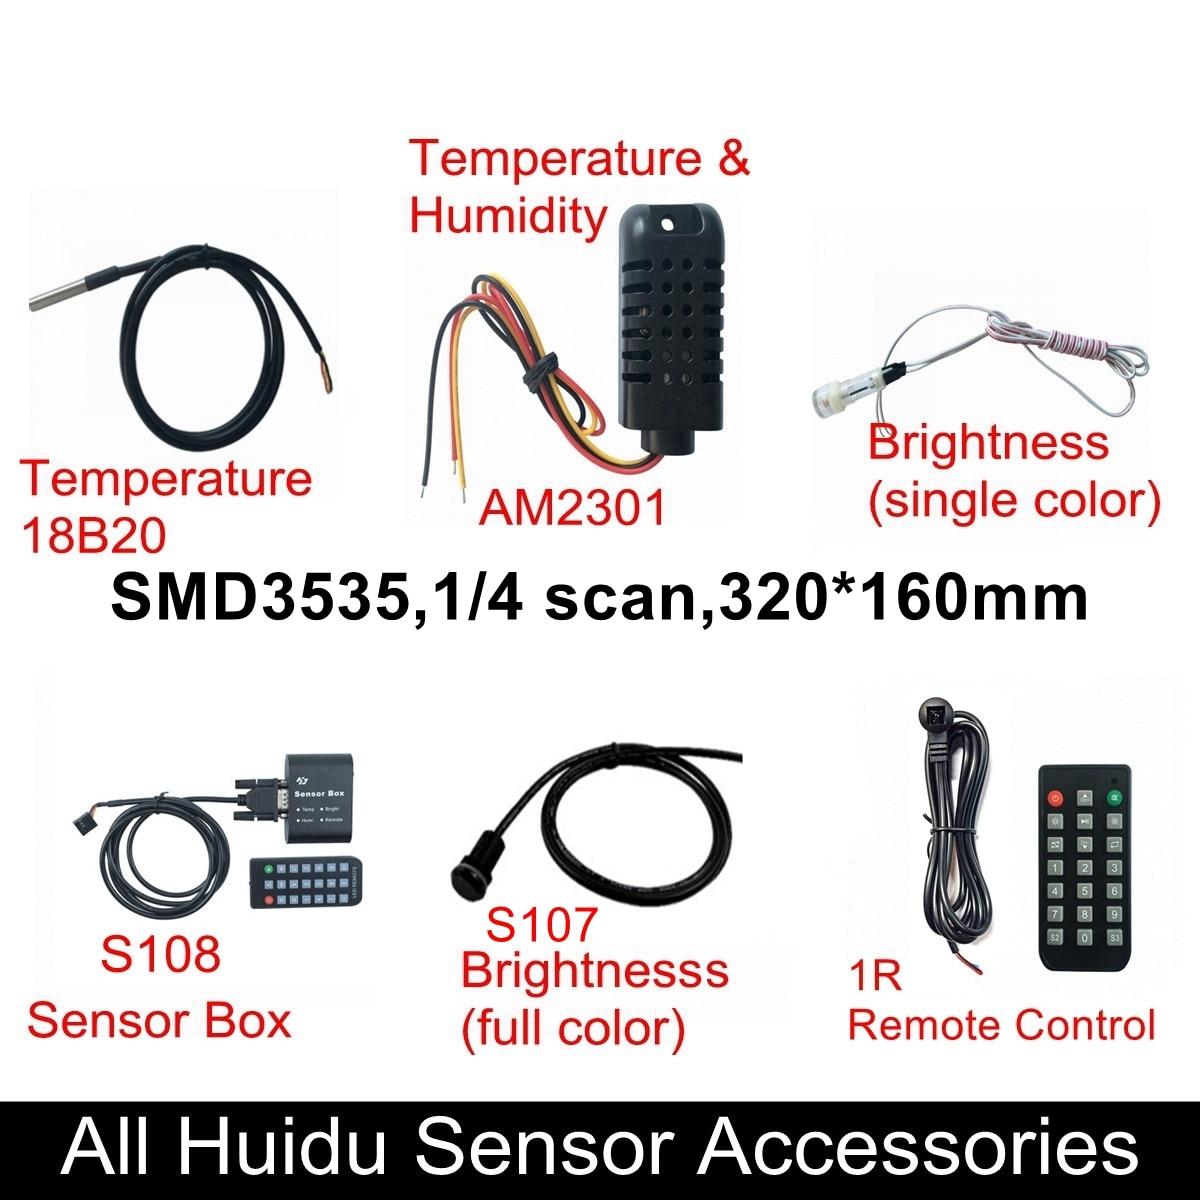 Huidu Sensors Temperature 18B20 Temperature And Humidity AM2301 Single RGB Brightness S107 S108 Box 1R Remote